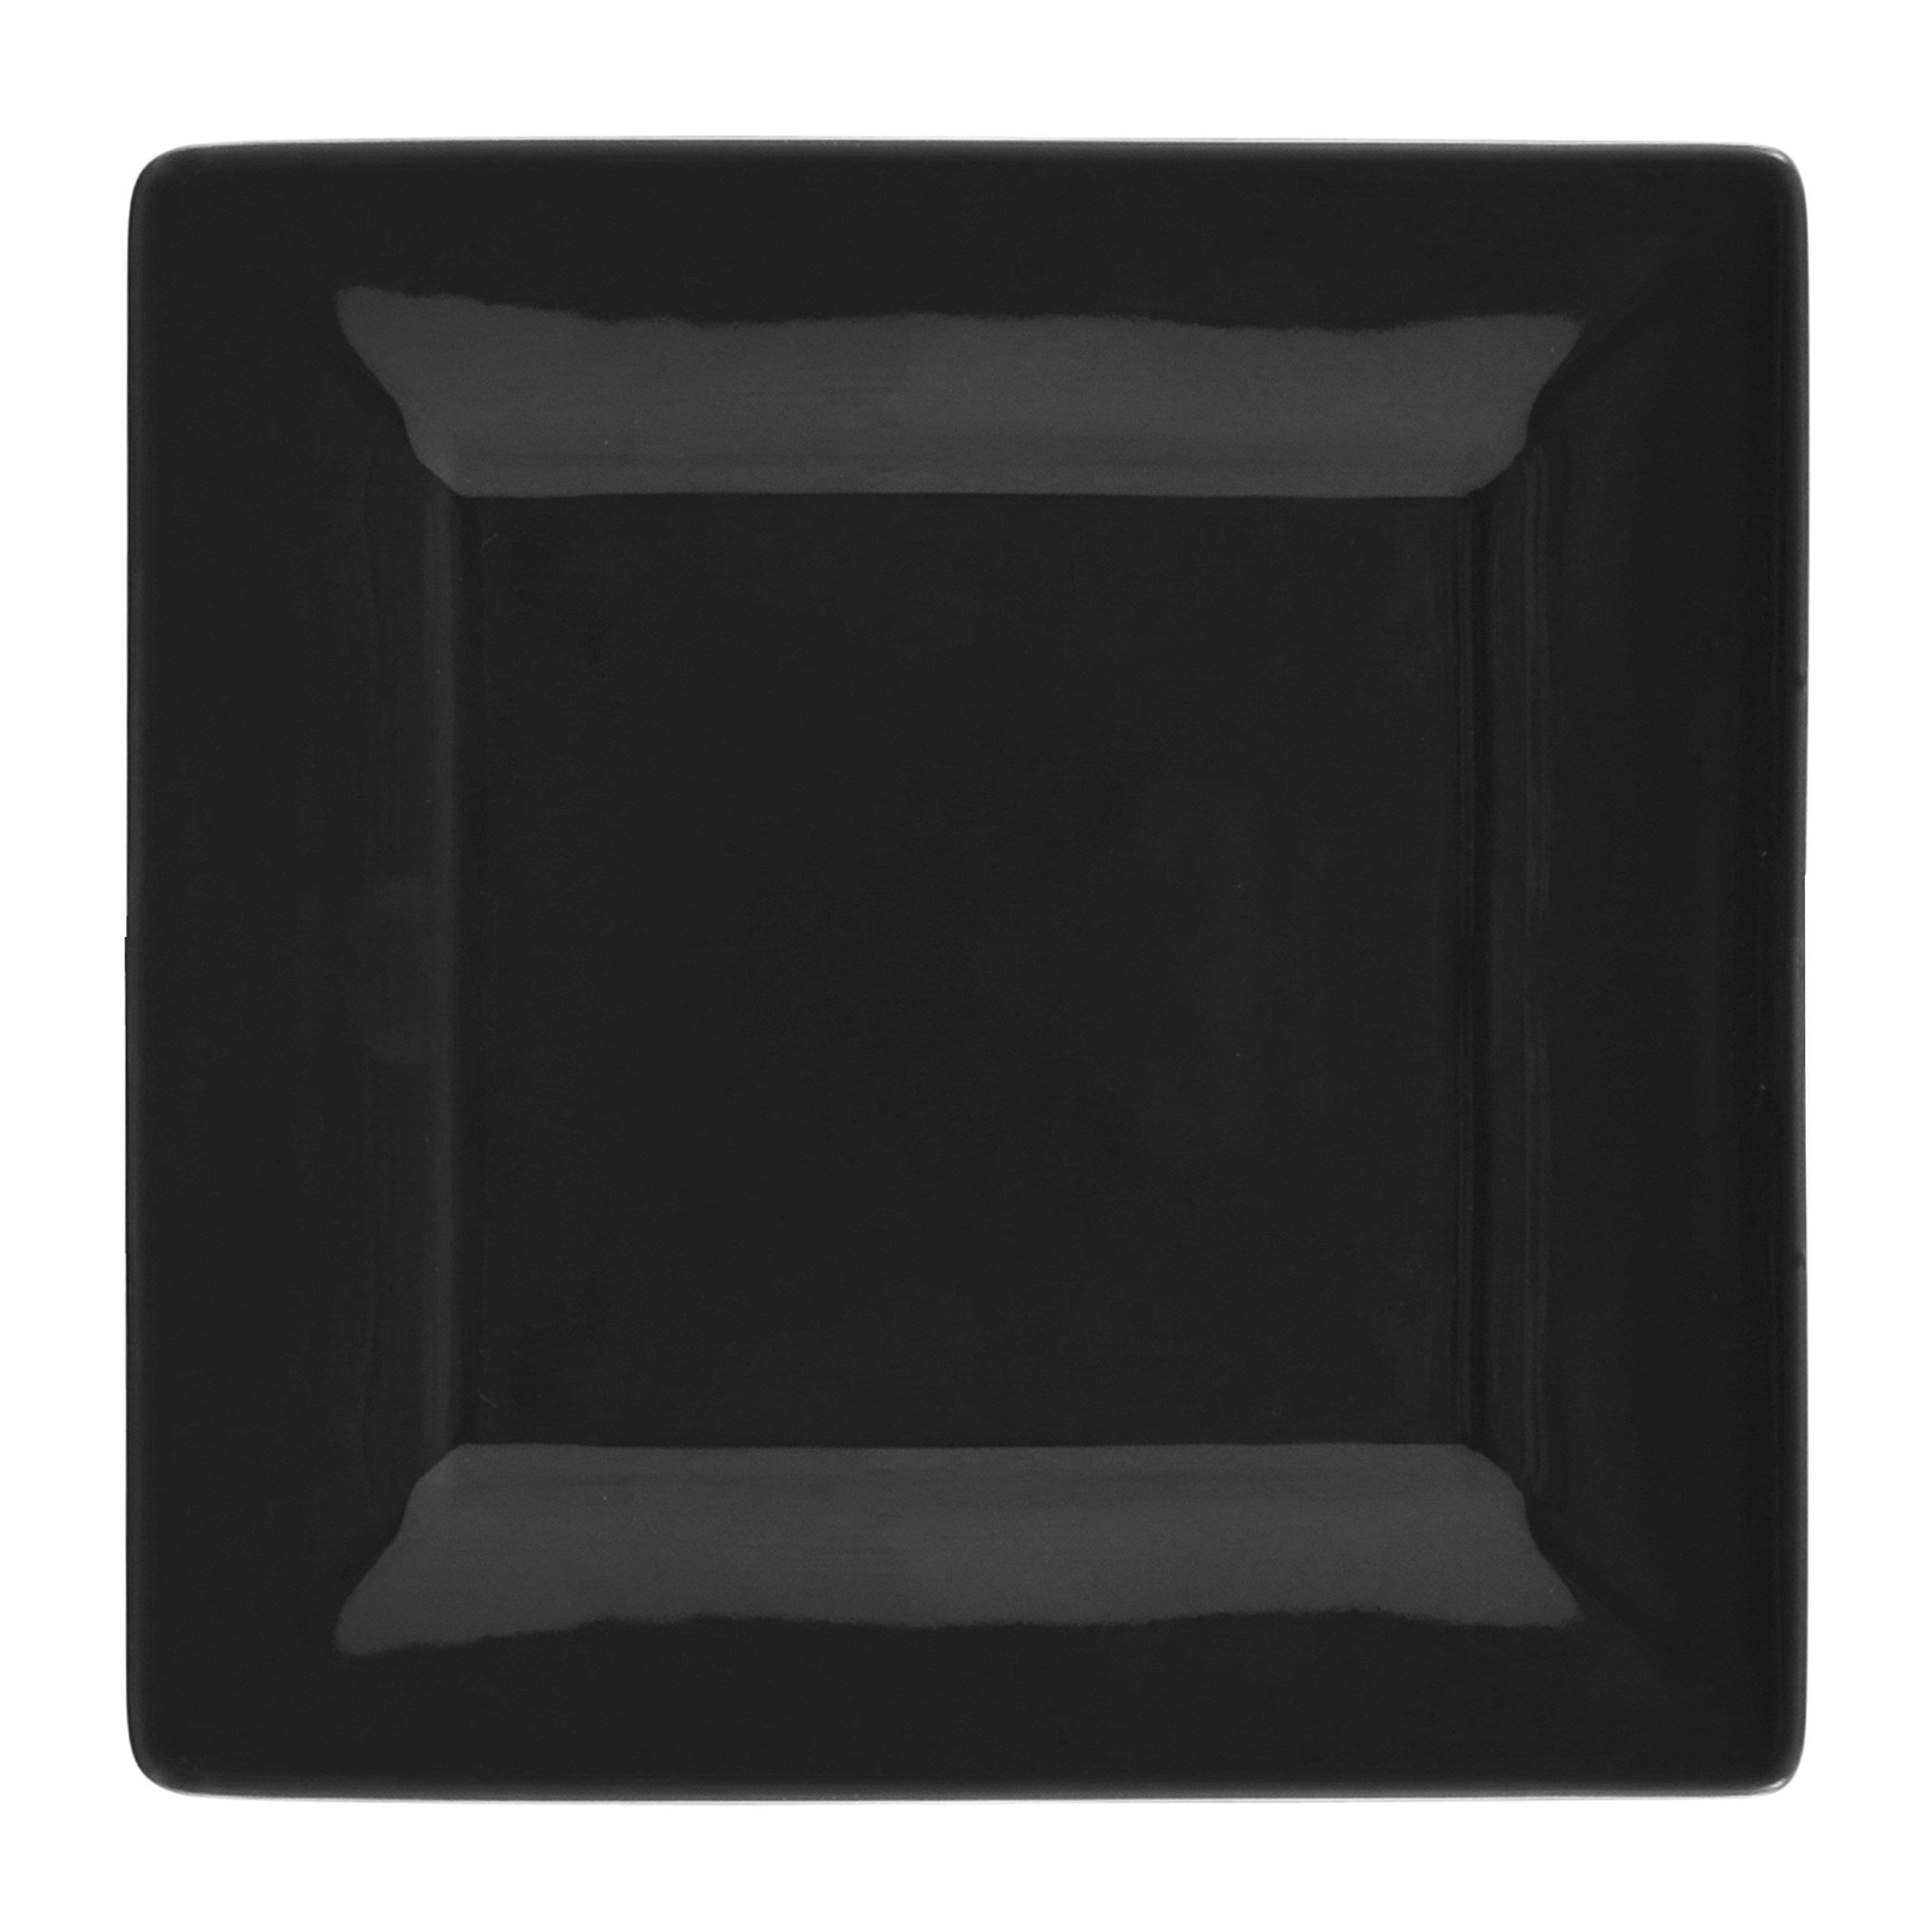 10 Strawberry Street Square 16 Piece Dinnerware Set, Black by 10 Strawberry Street (Image #2)